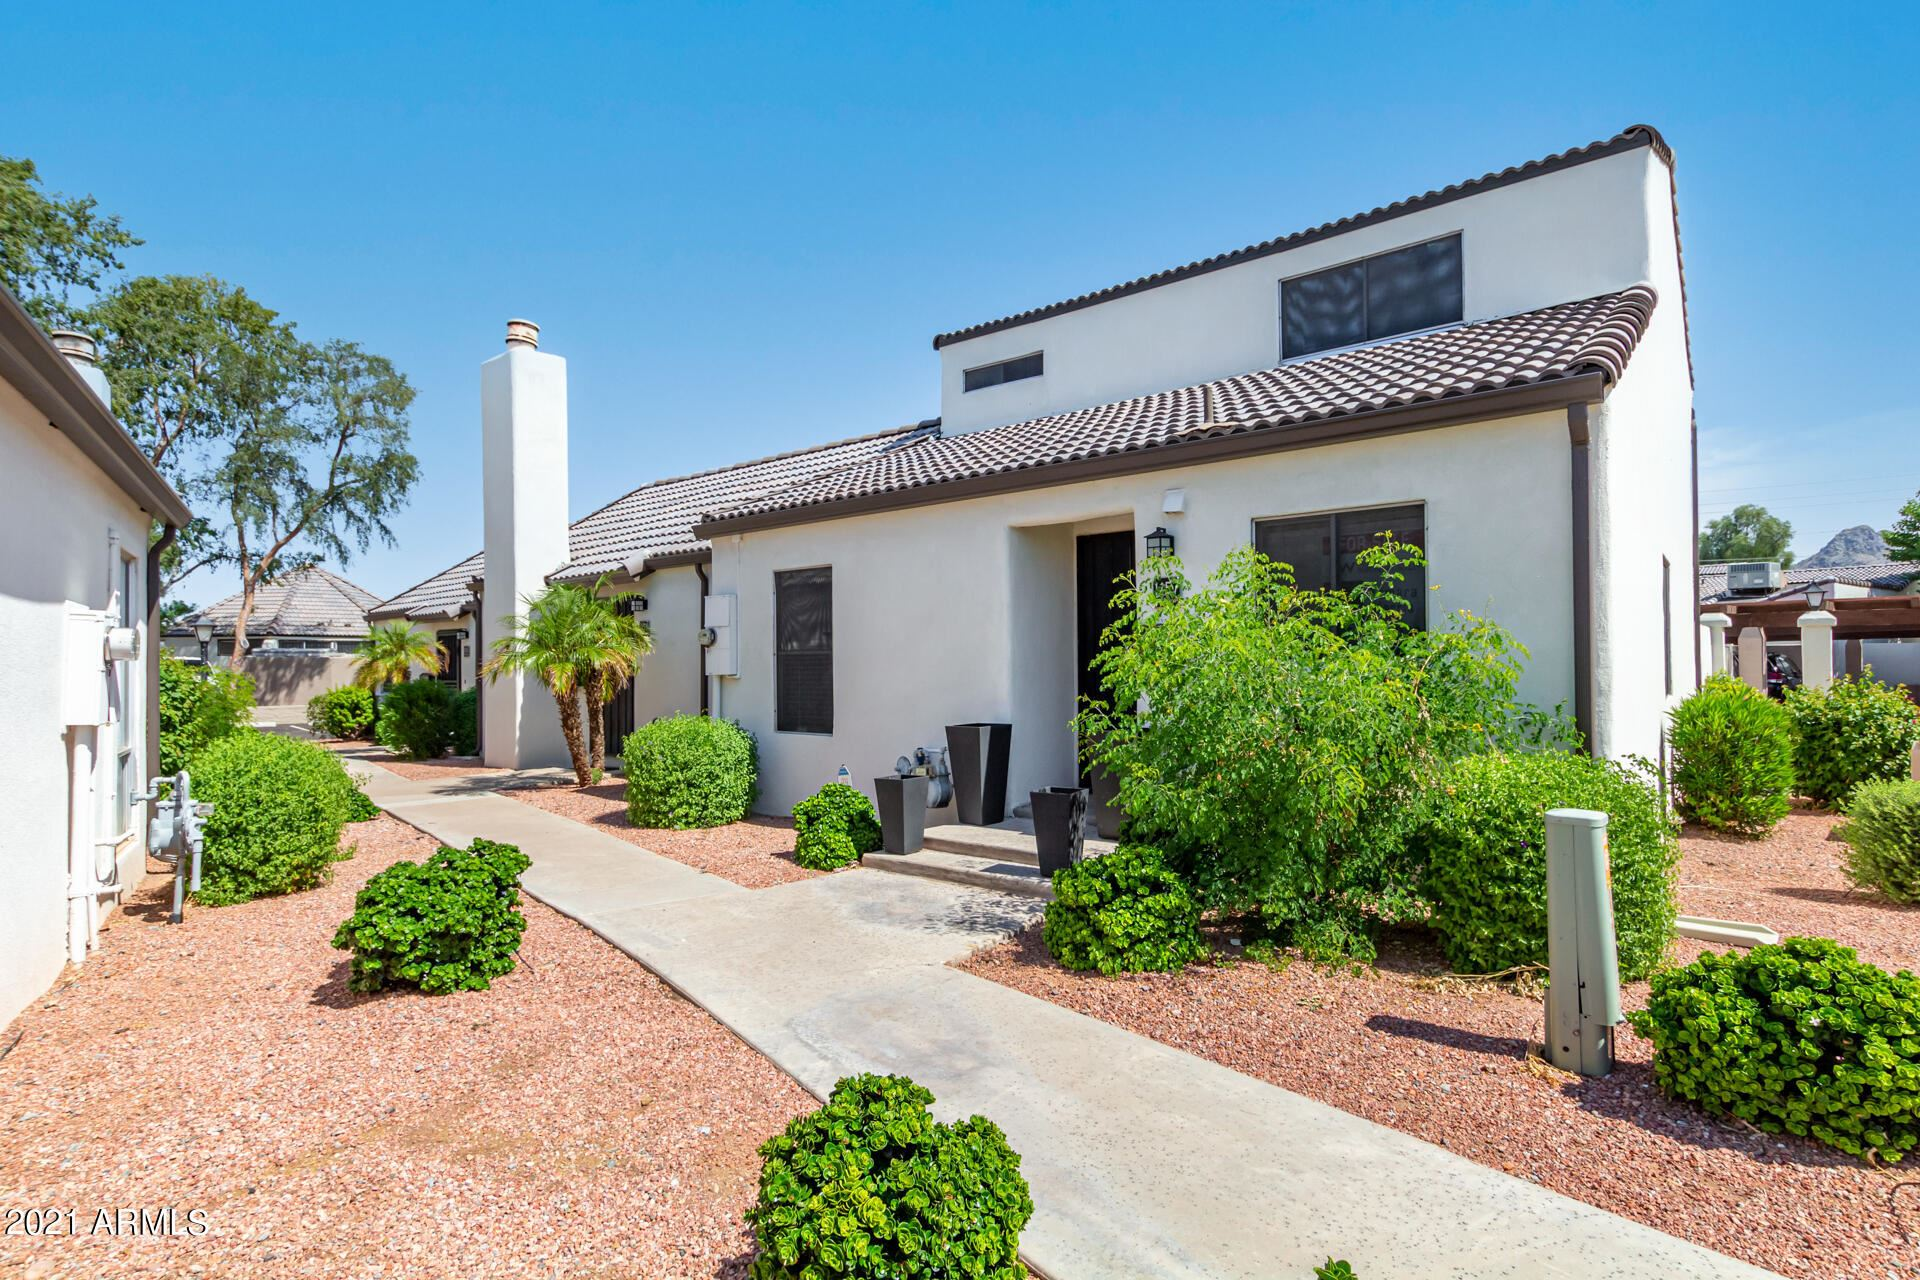 Photo of 1157 E BELMONT Avenue, Phoenix, AZ 85020 (MLS # 6283689)